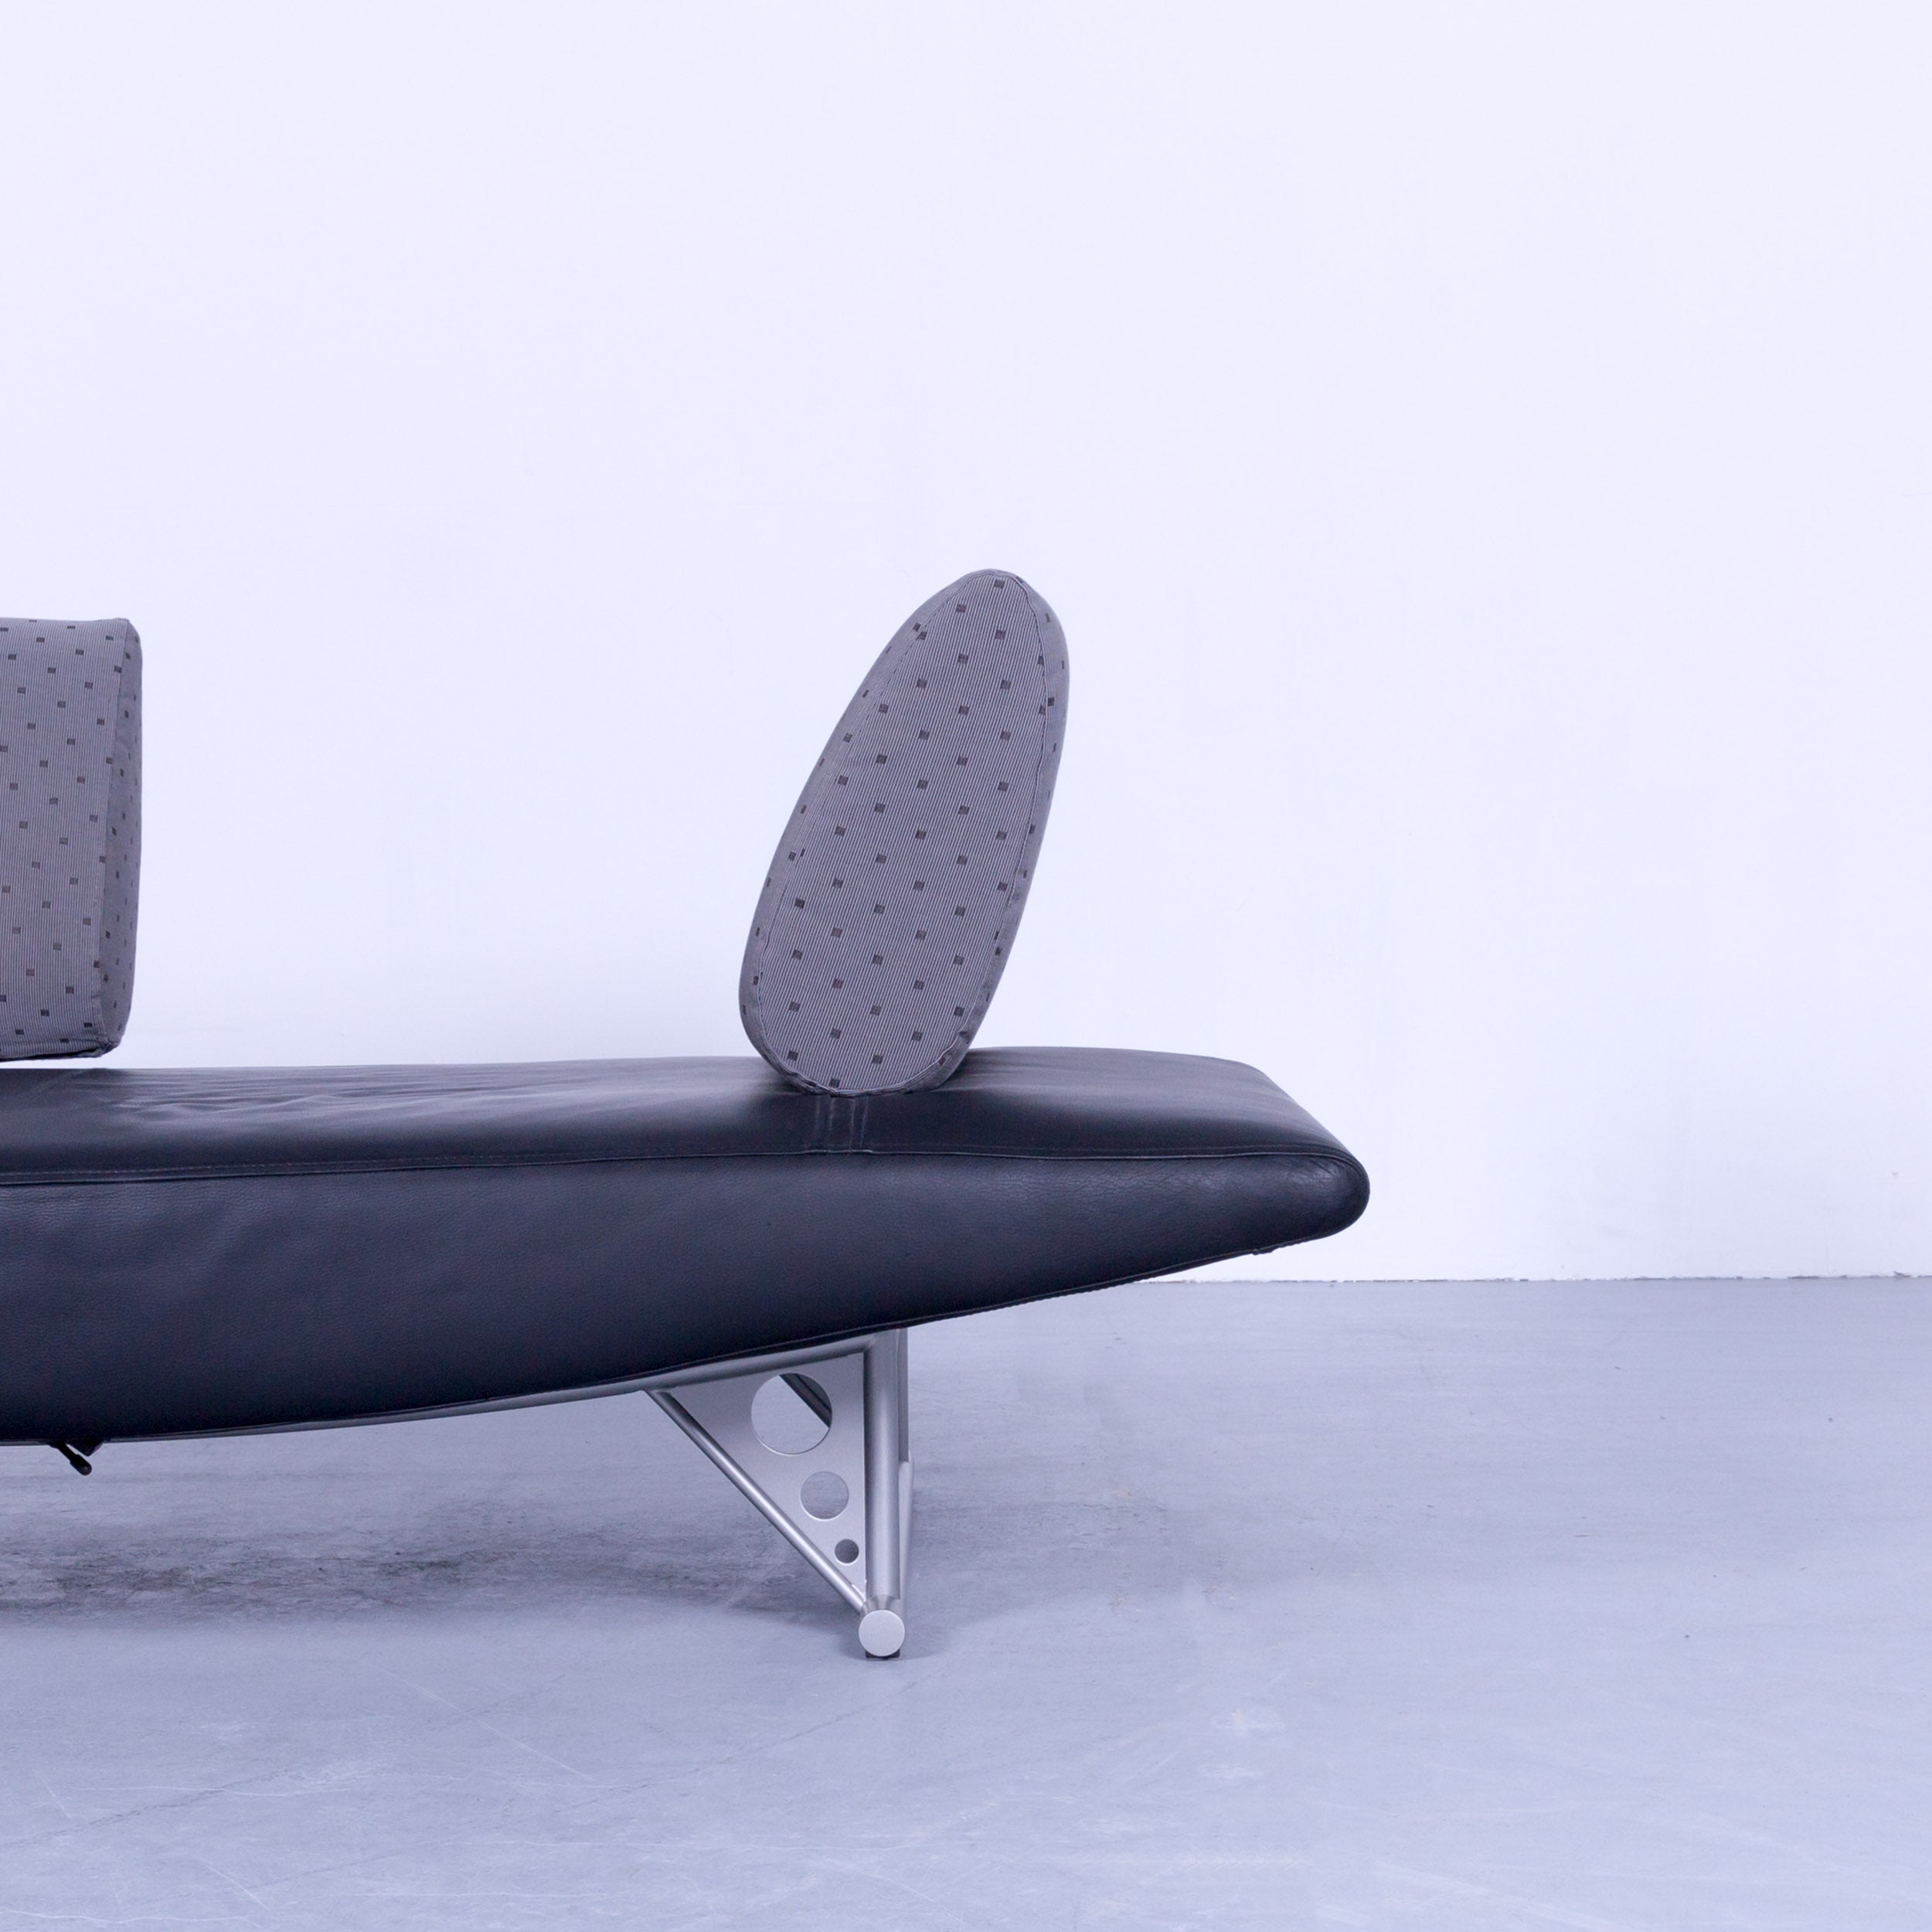 Cor Cirrus Designer Sofa Black Leather Function Modern Made In